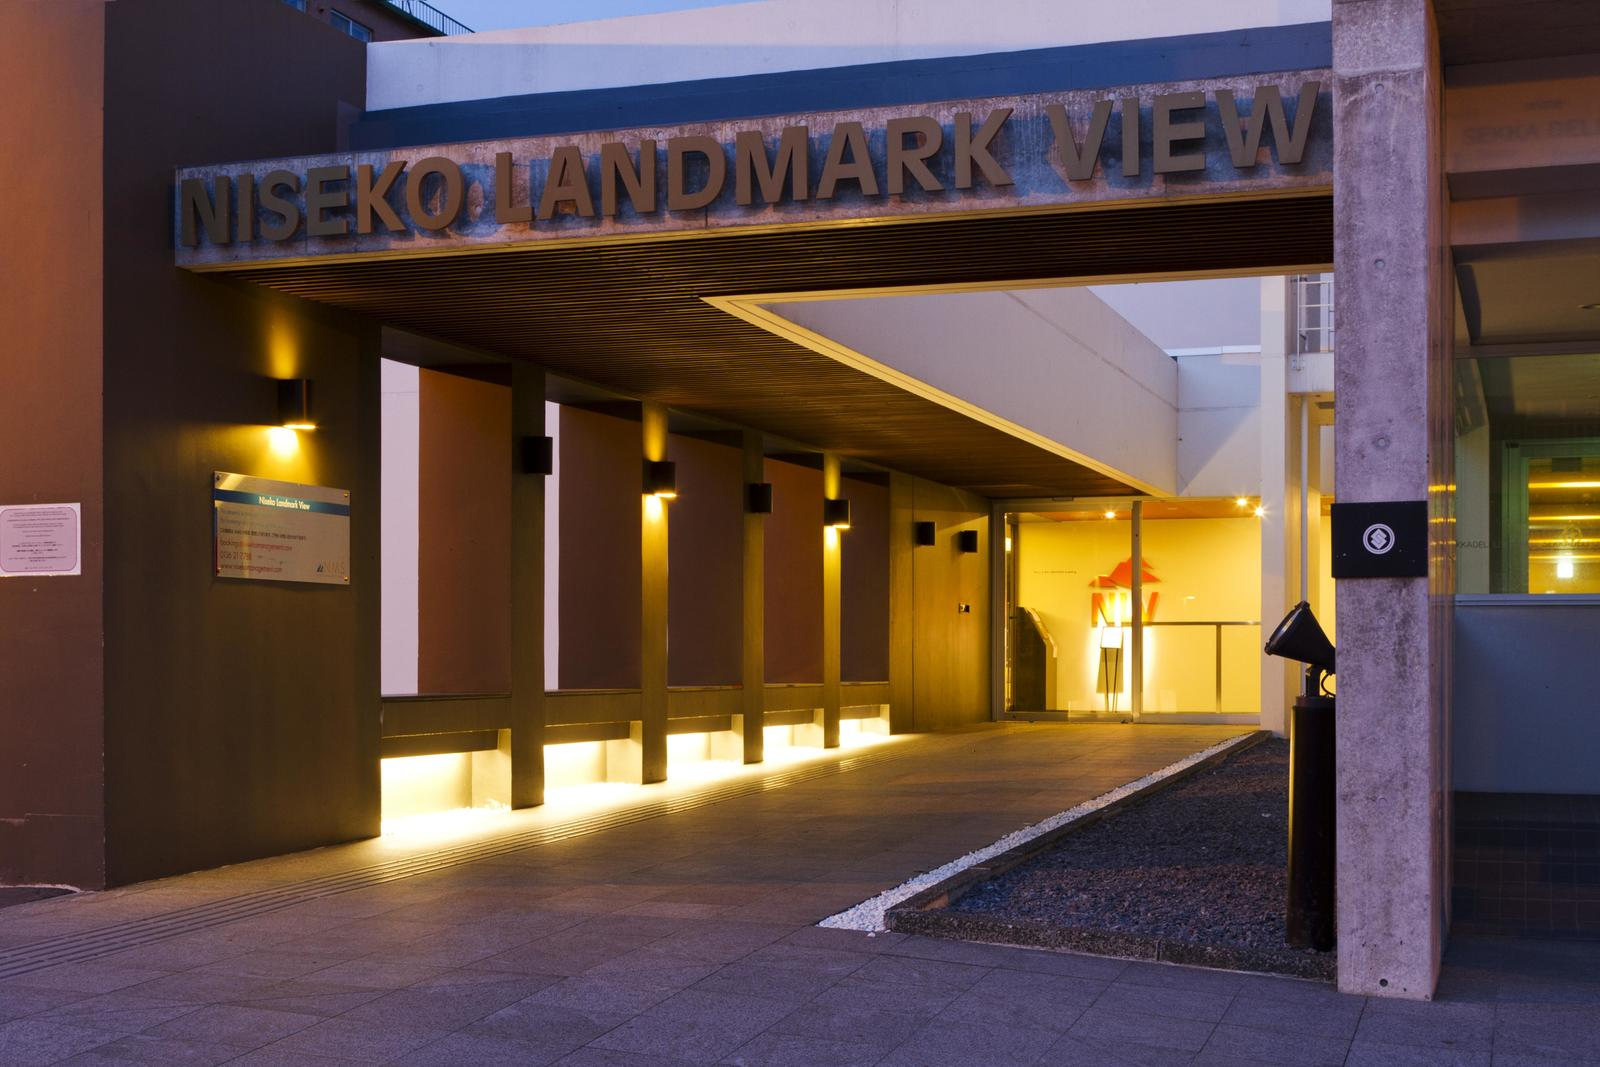 Niseko landmark view large